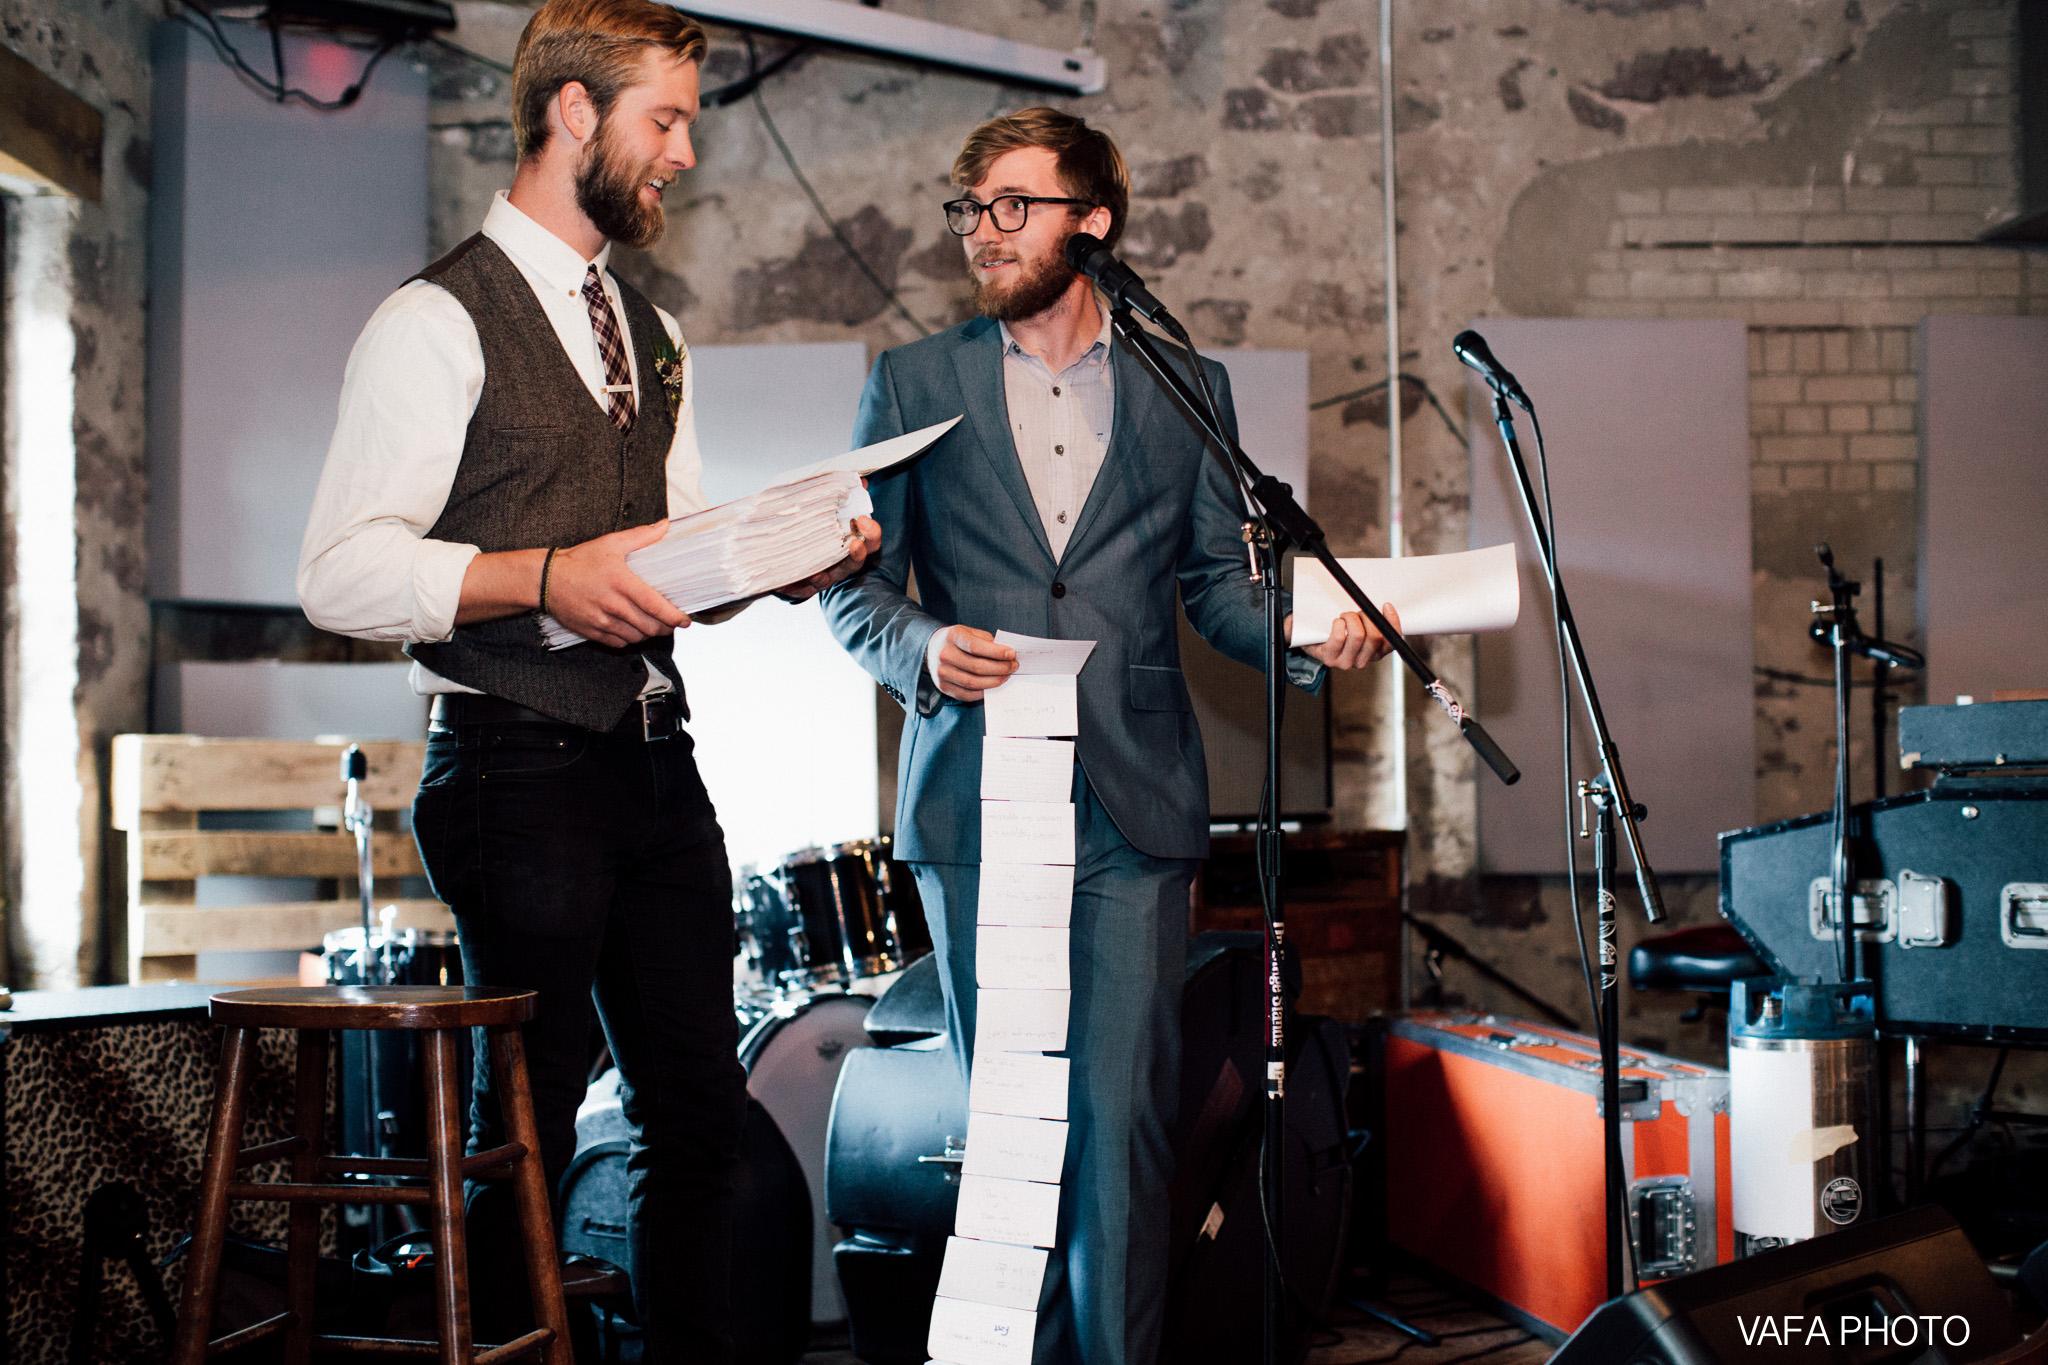 Hogback-Mountain-Wedding-Chelsea-Josh-Vafa-Photo-813.jpg